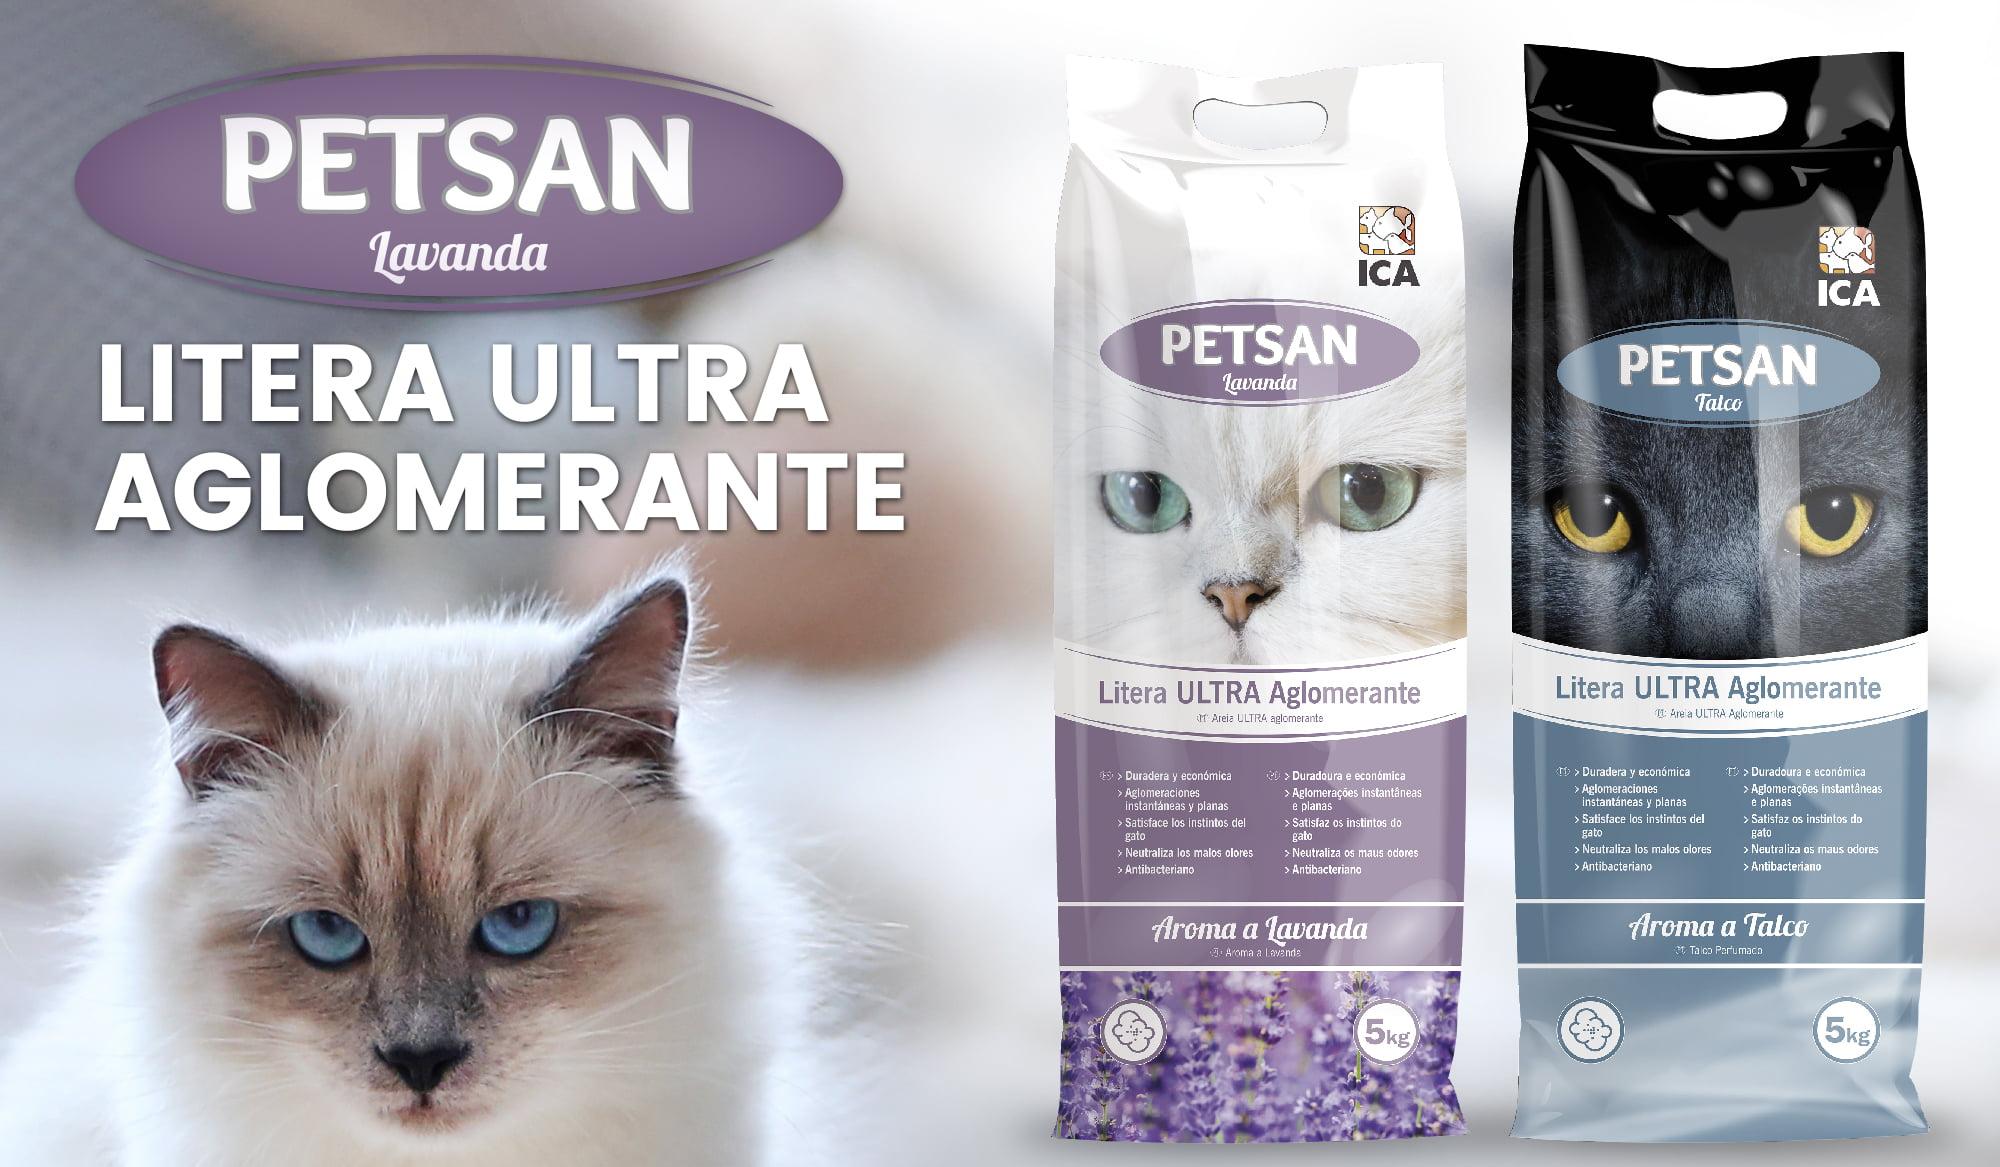 PETSAN: literas ULTRA aglomerantes para gatos